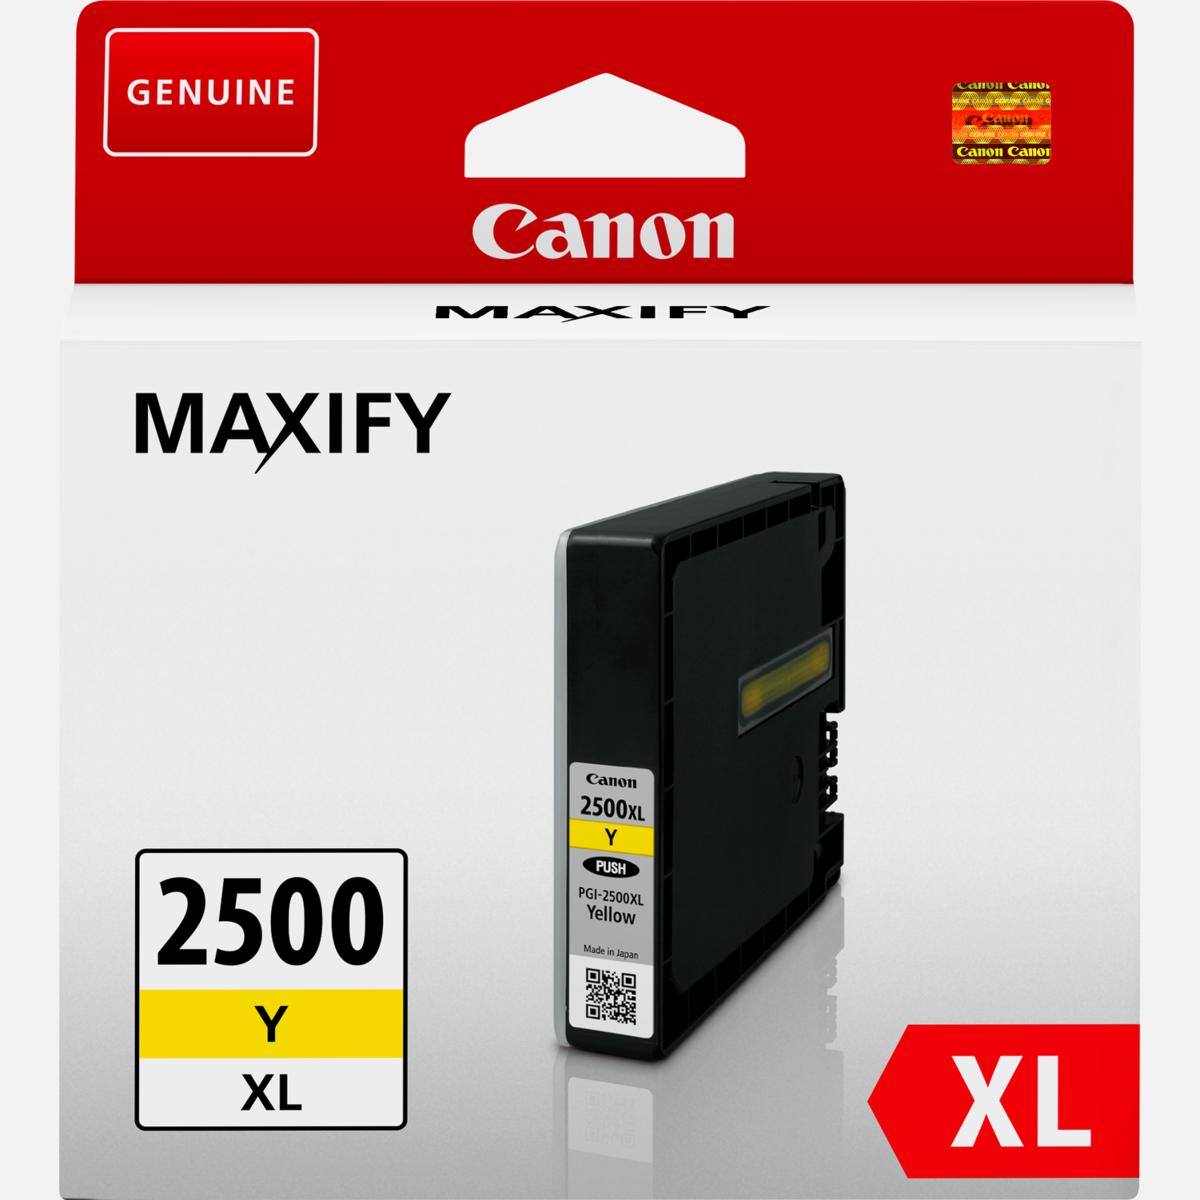 Cartridge Canon PGI-2500XL Y, Canon 9267B001 - originálny (Žltá)